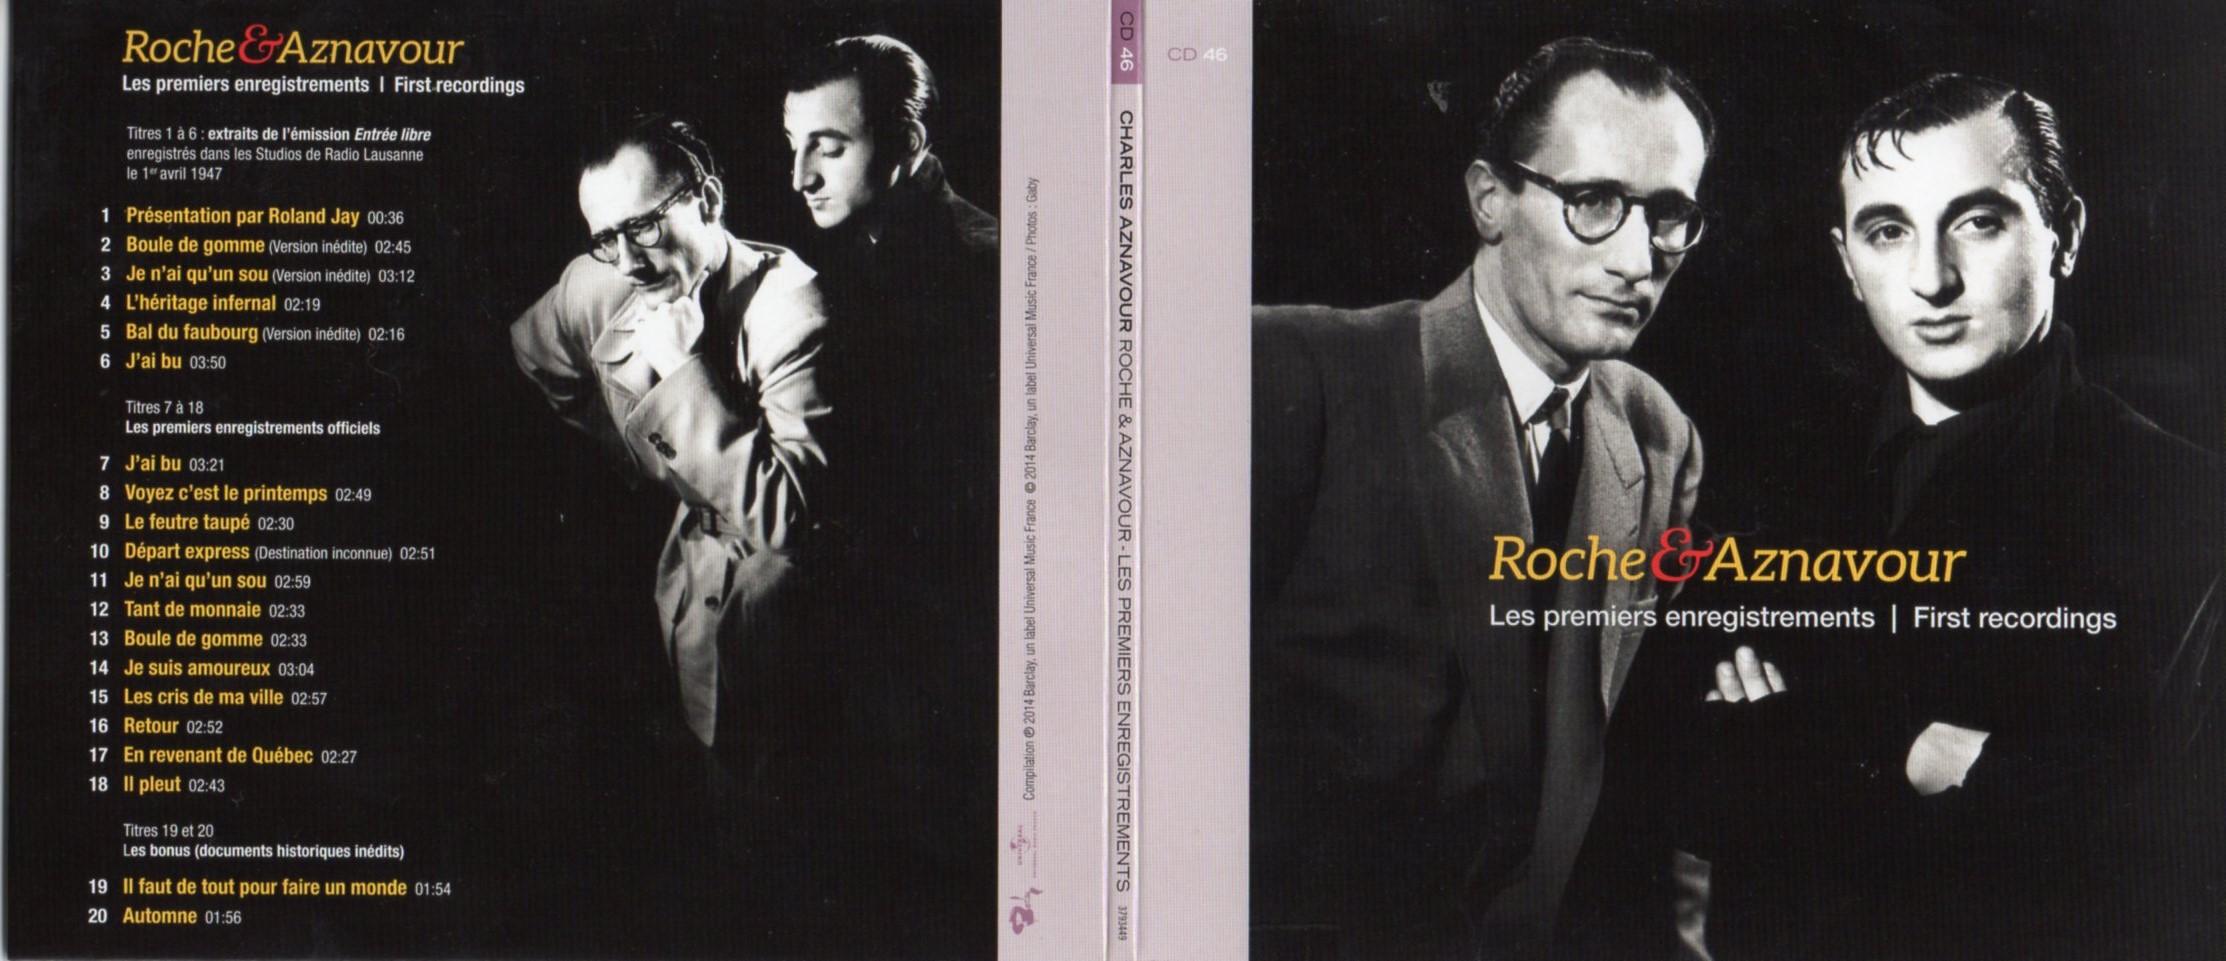 CHARLES AZNAVOUR - Roche & Aznavour - Les premiers enregistrements - Inédits -  Gatefold Card board sleeve - CD